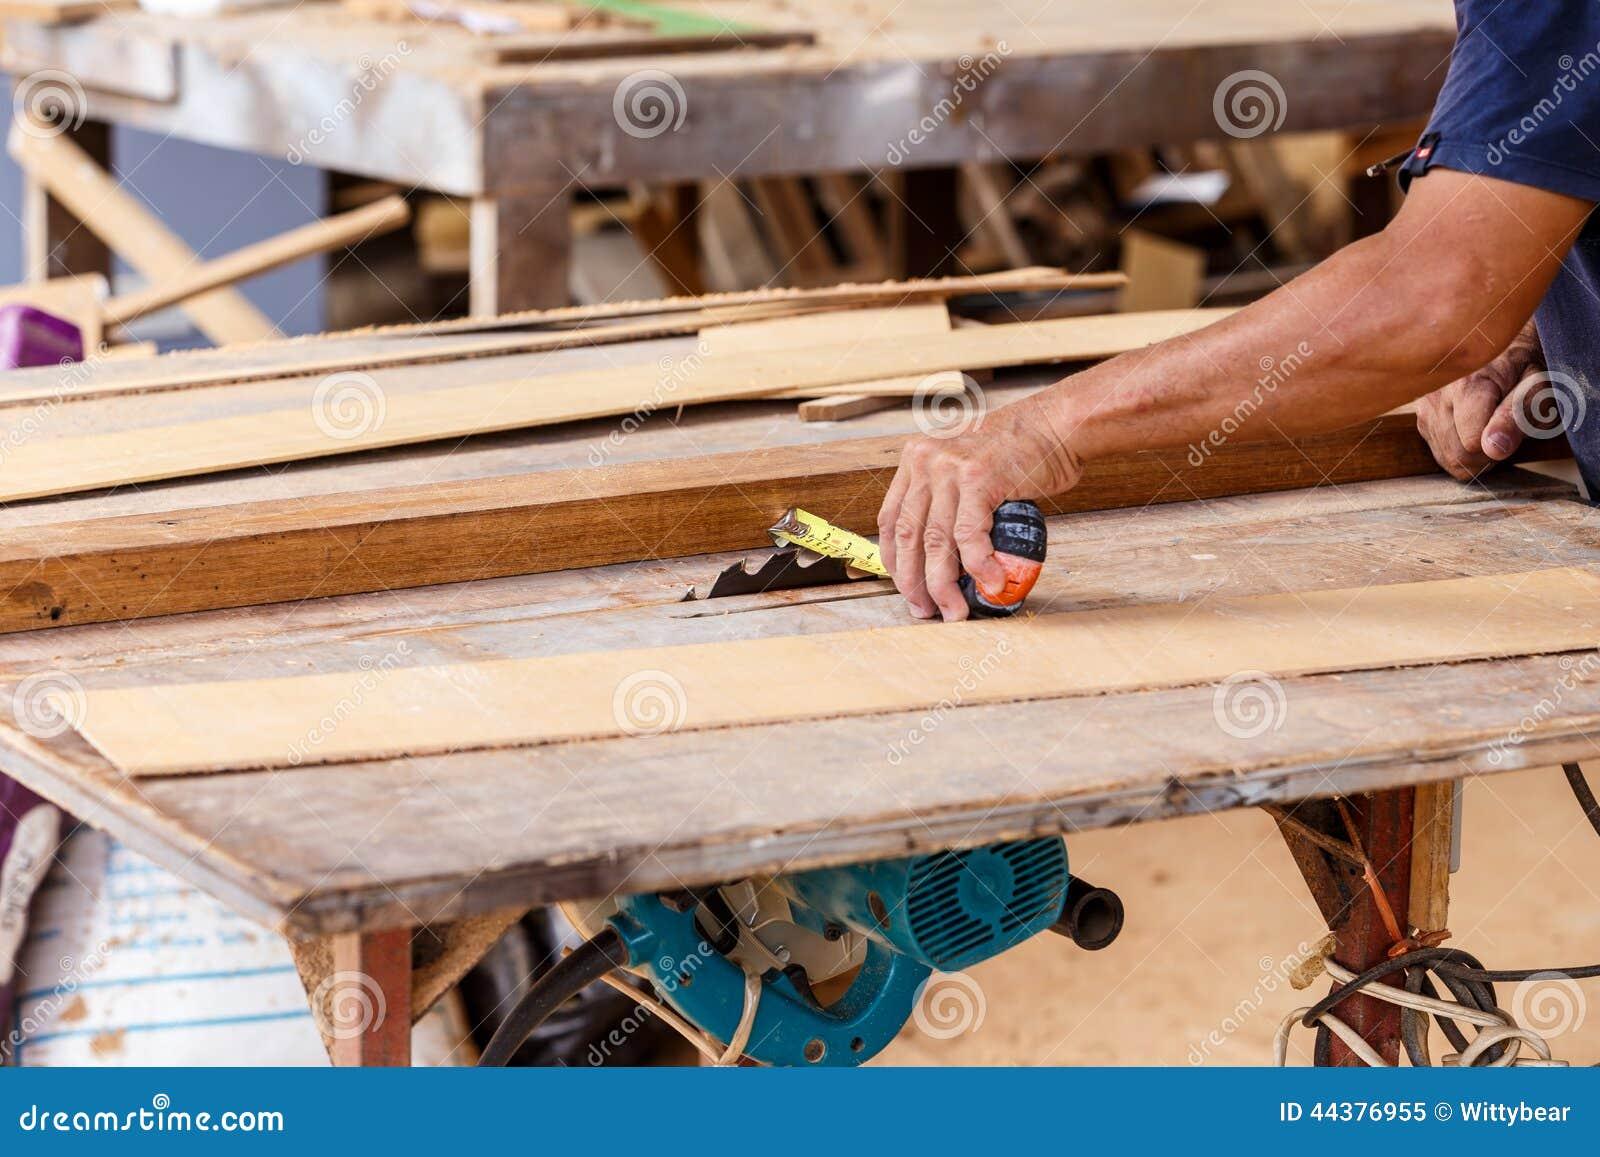 carpenter use saw cut wood for make new furniture stock photo image 44376955. Black Bedroom Furniture Sets. Home Design Ideas